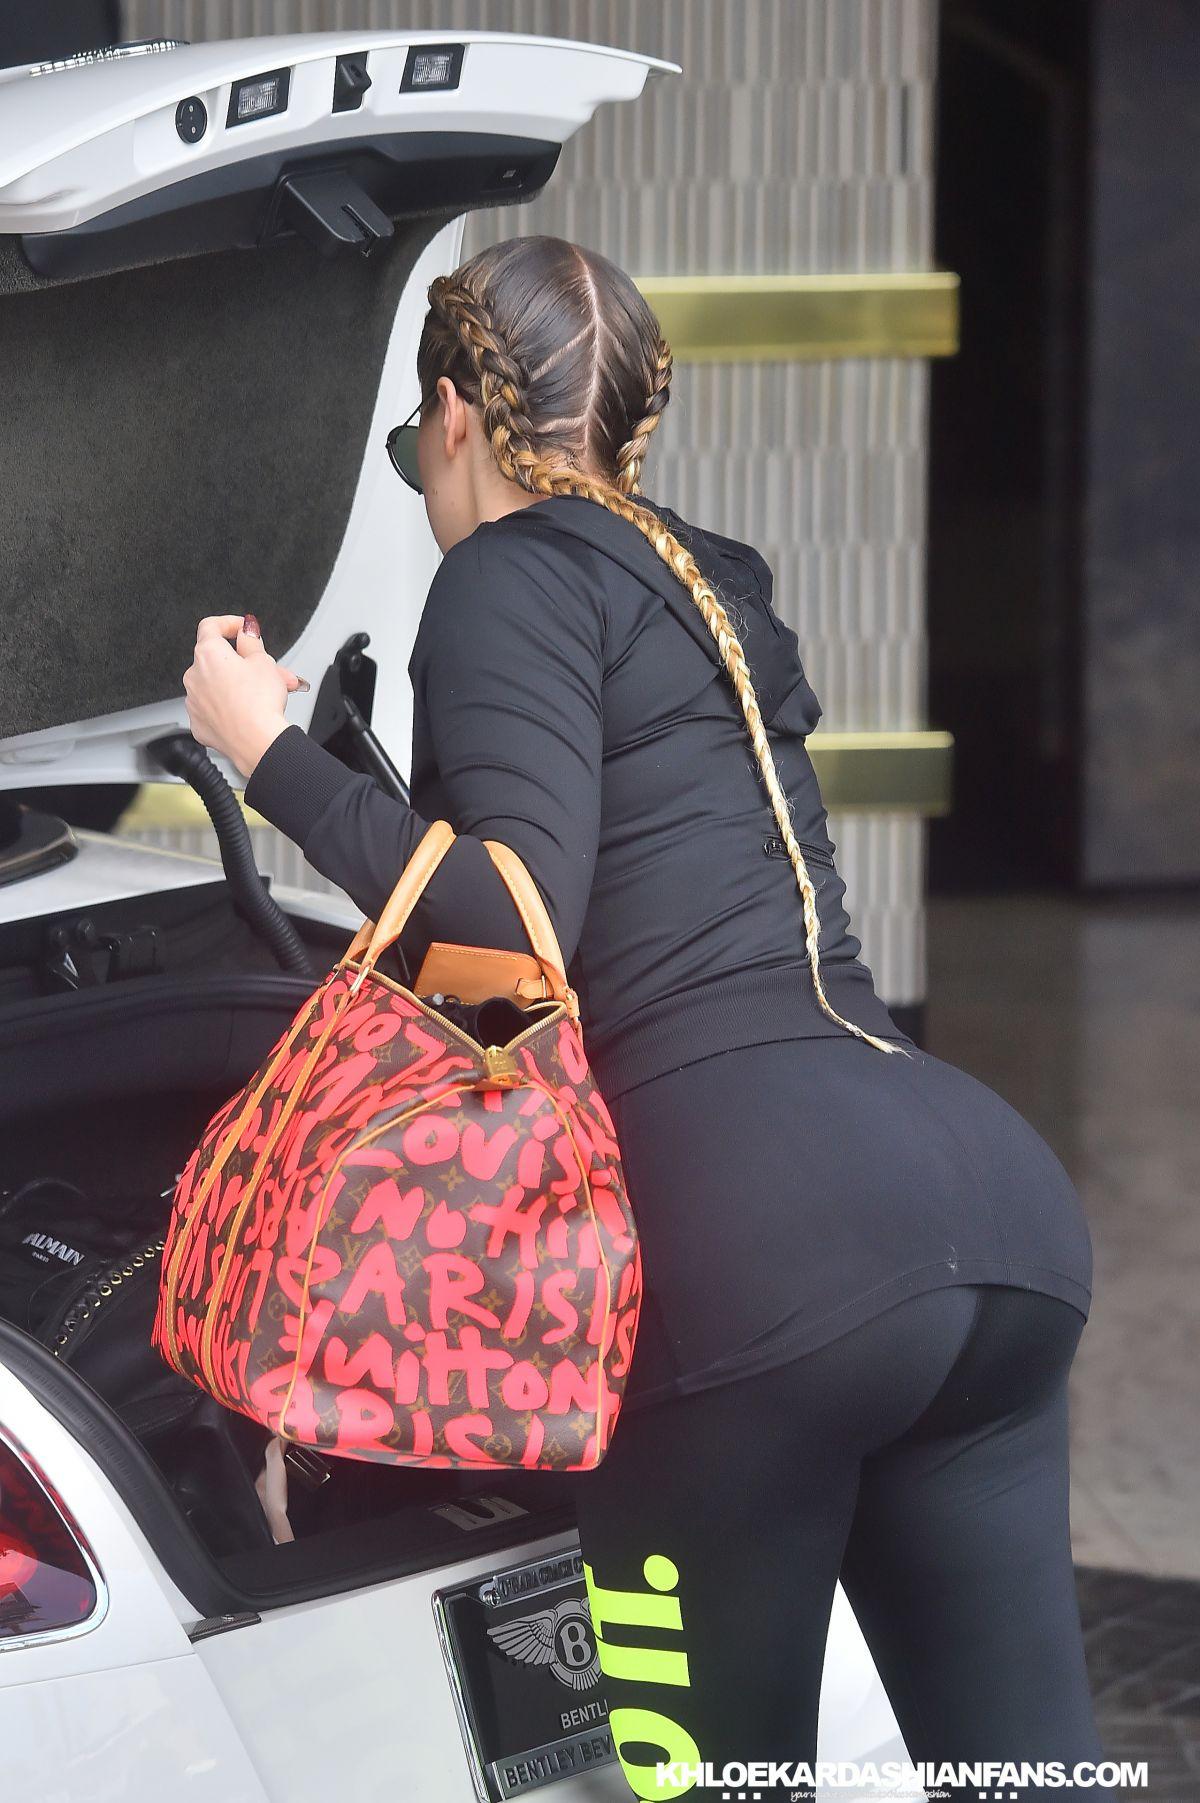 KHLOE KARDASHIAN Arrives at The London Hotel in West Hollywood